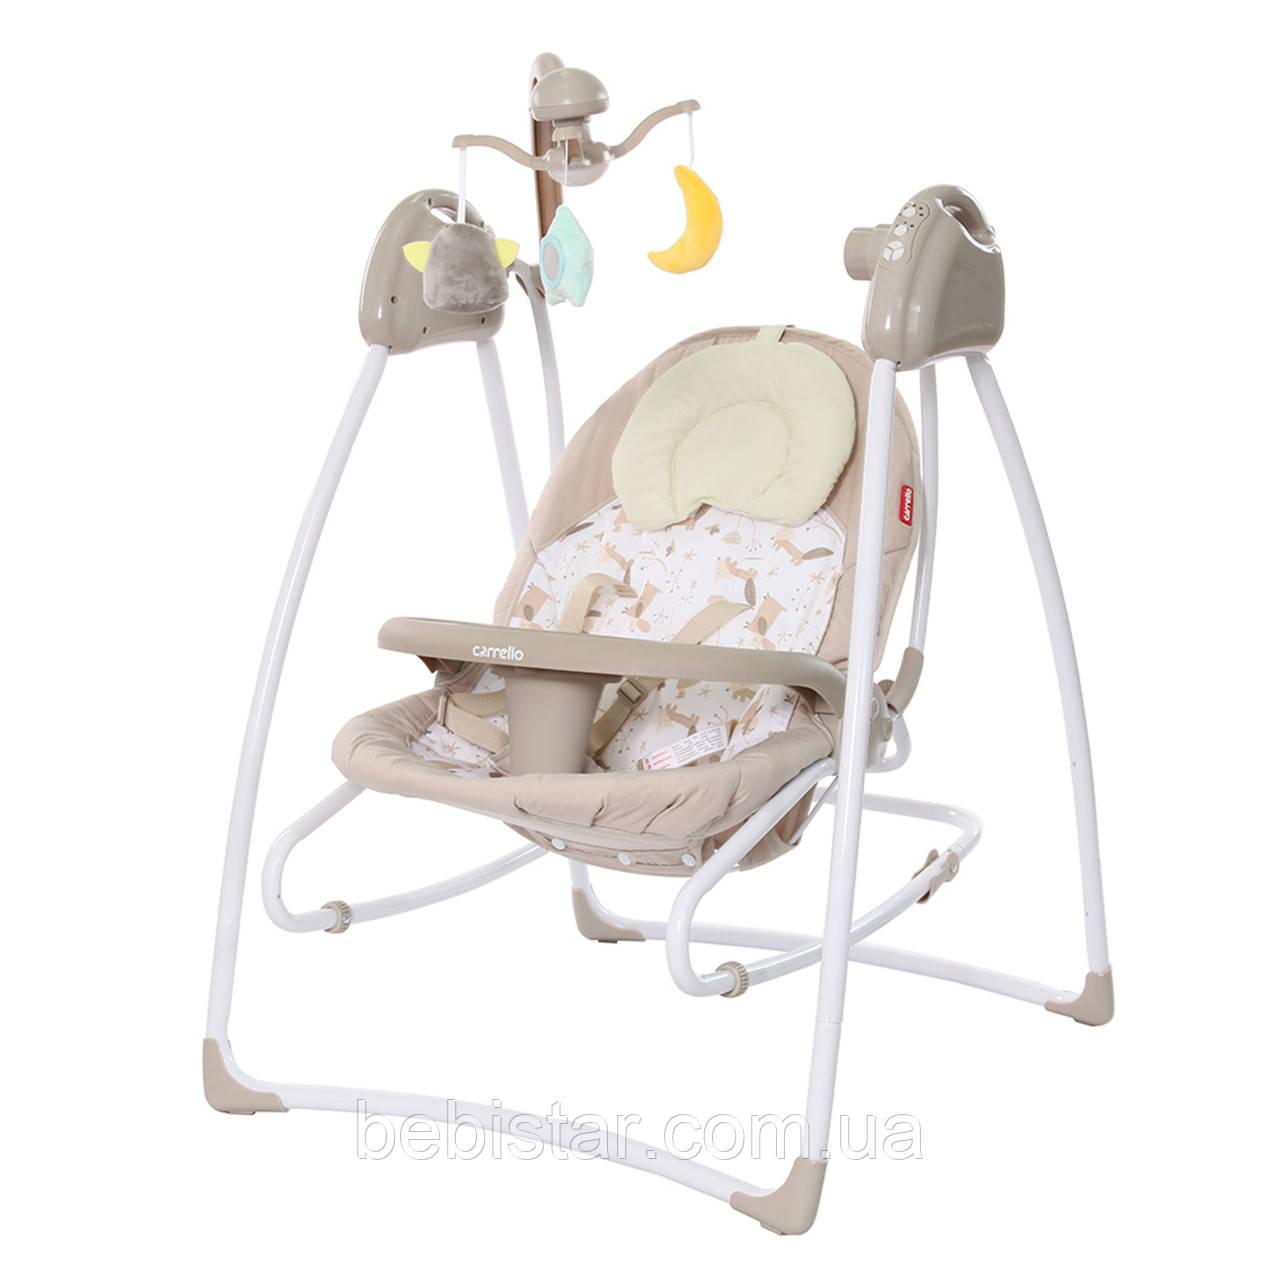 Кресло-качалка шезлонг 3в1 бежевая питание от сети и батареек CARRELLO Grazia CRL-7502 Fall Beige с рождения